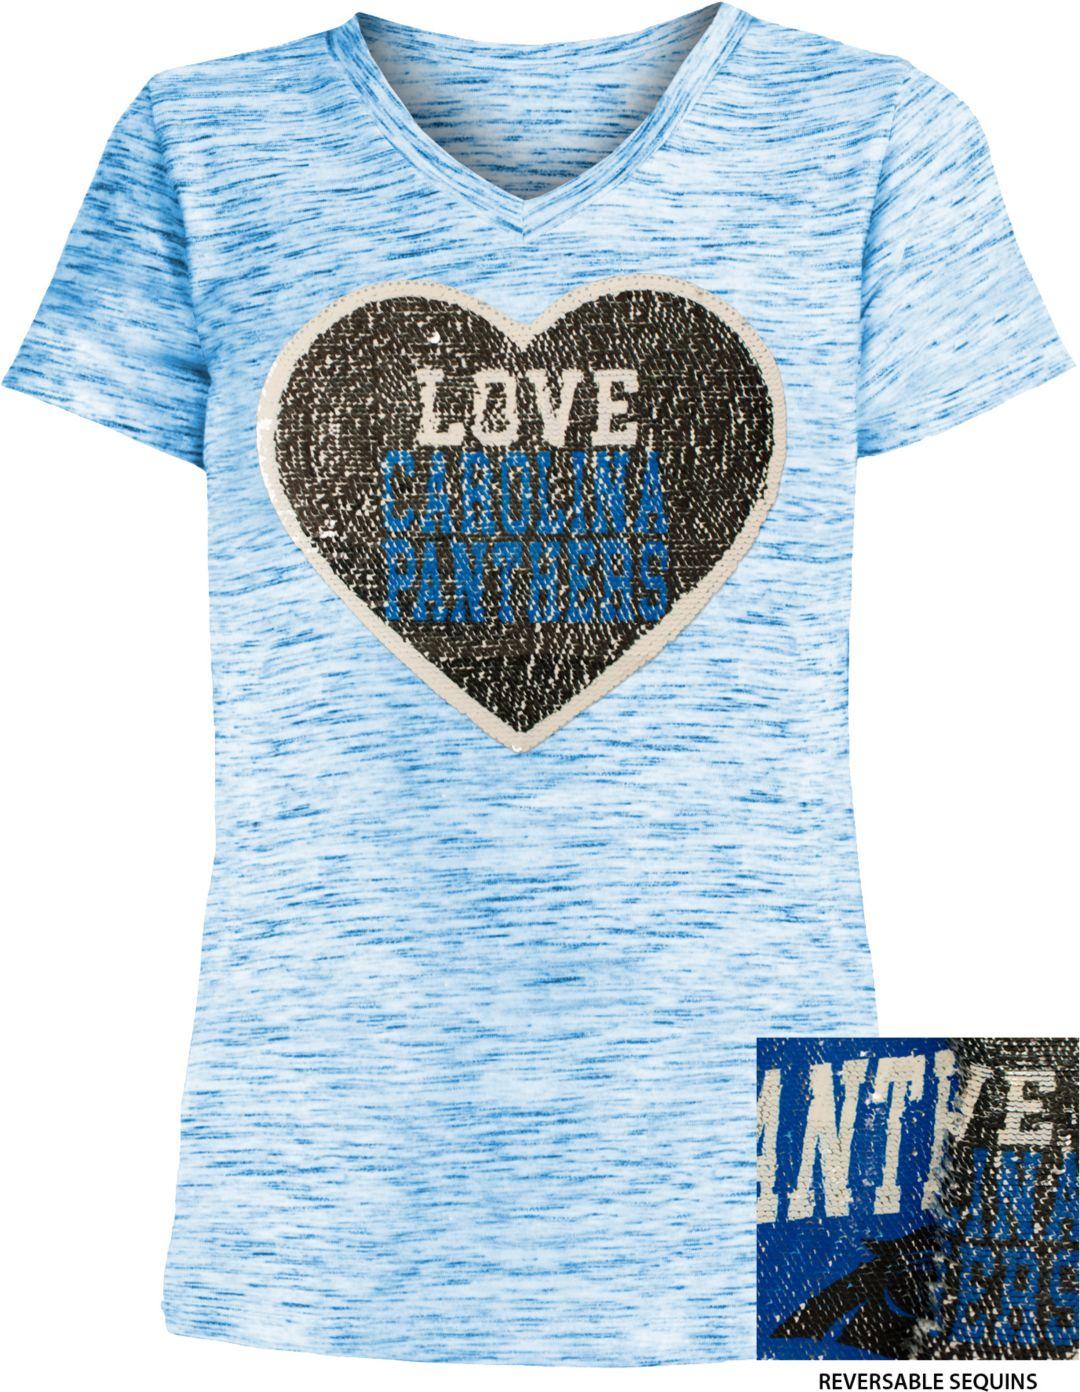 factory authentic 9009c af973 NFL Team Apparel Girls' Carolina Panthers Sequins Heart Blue Reversible  T-Shirt